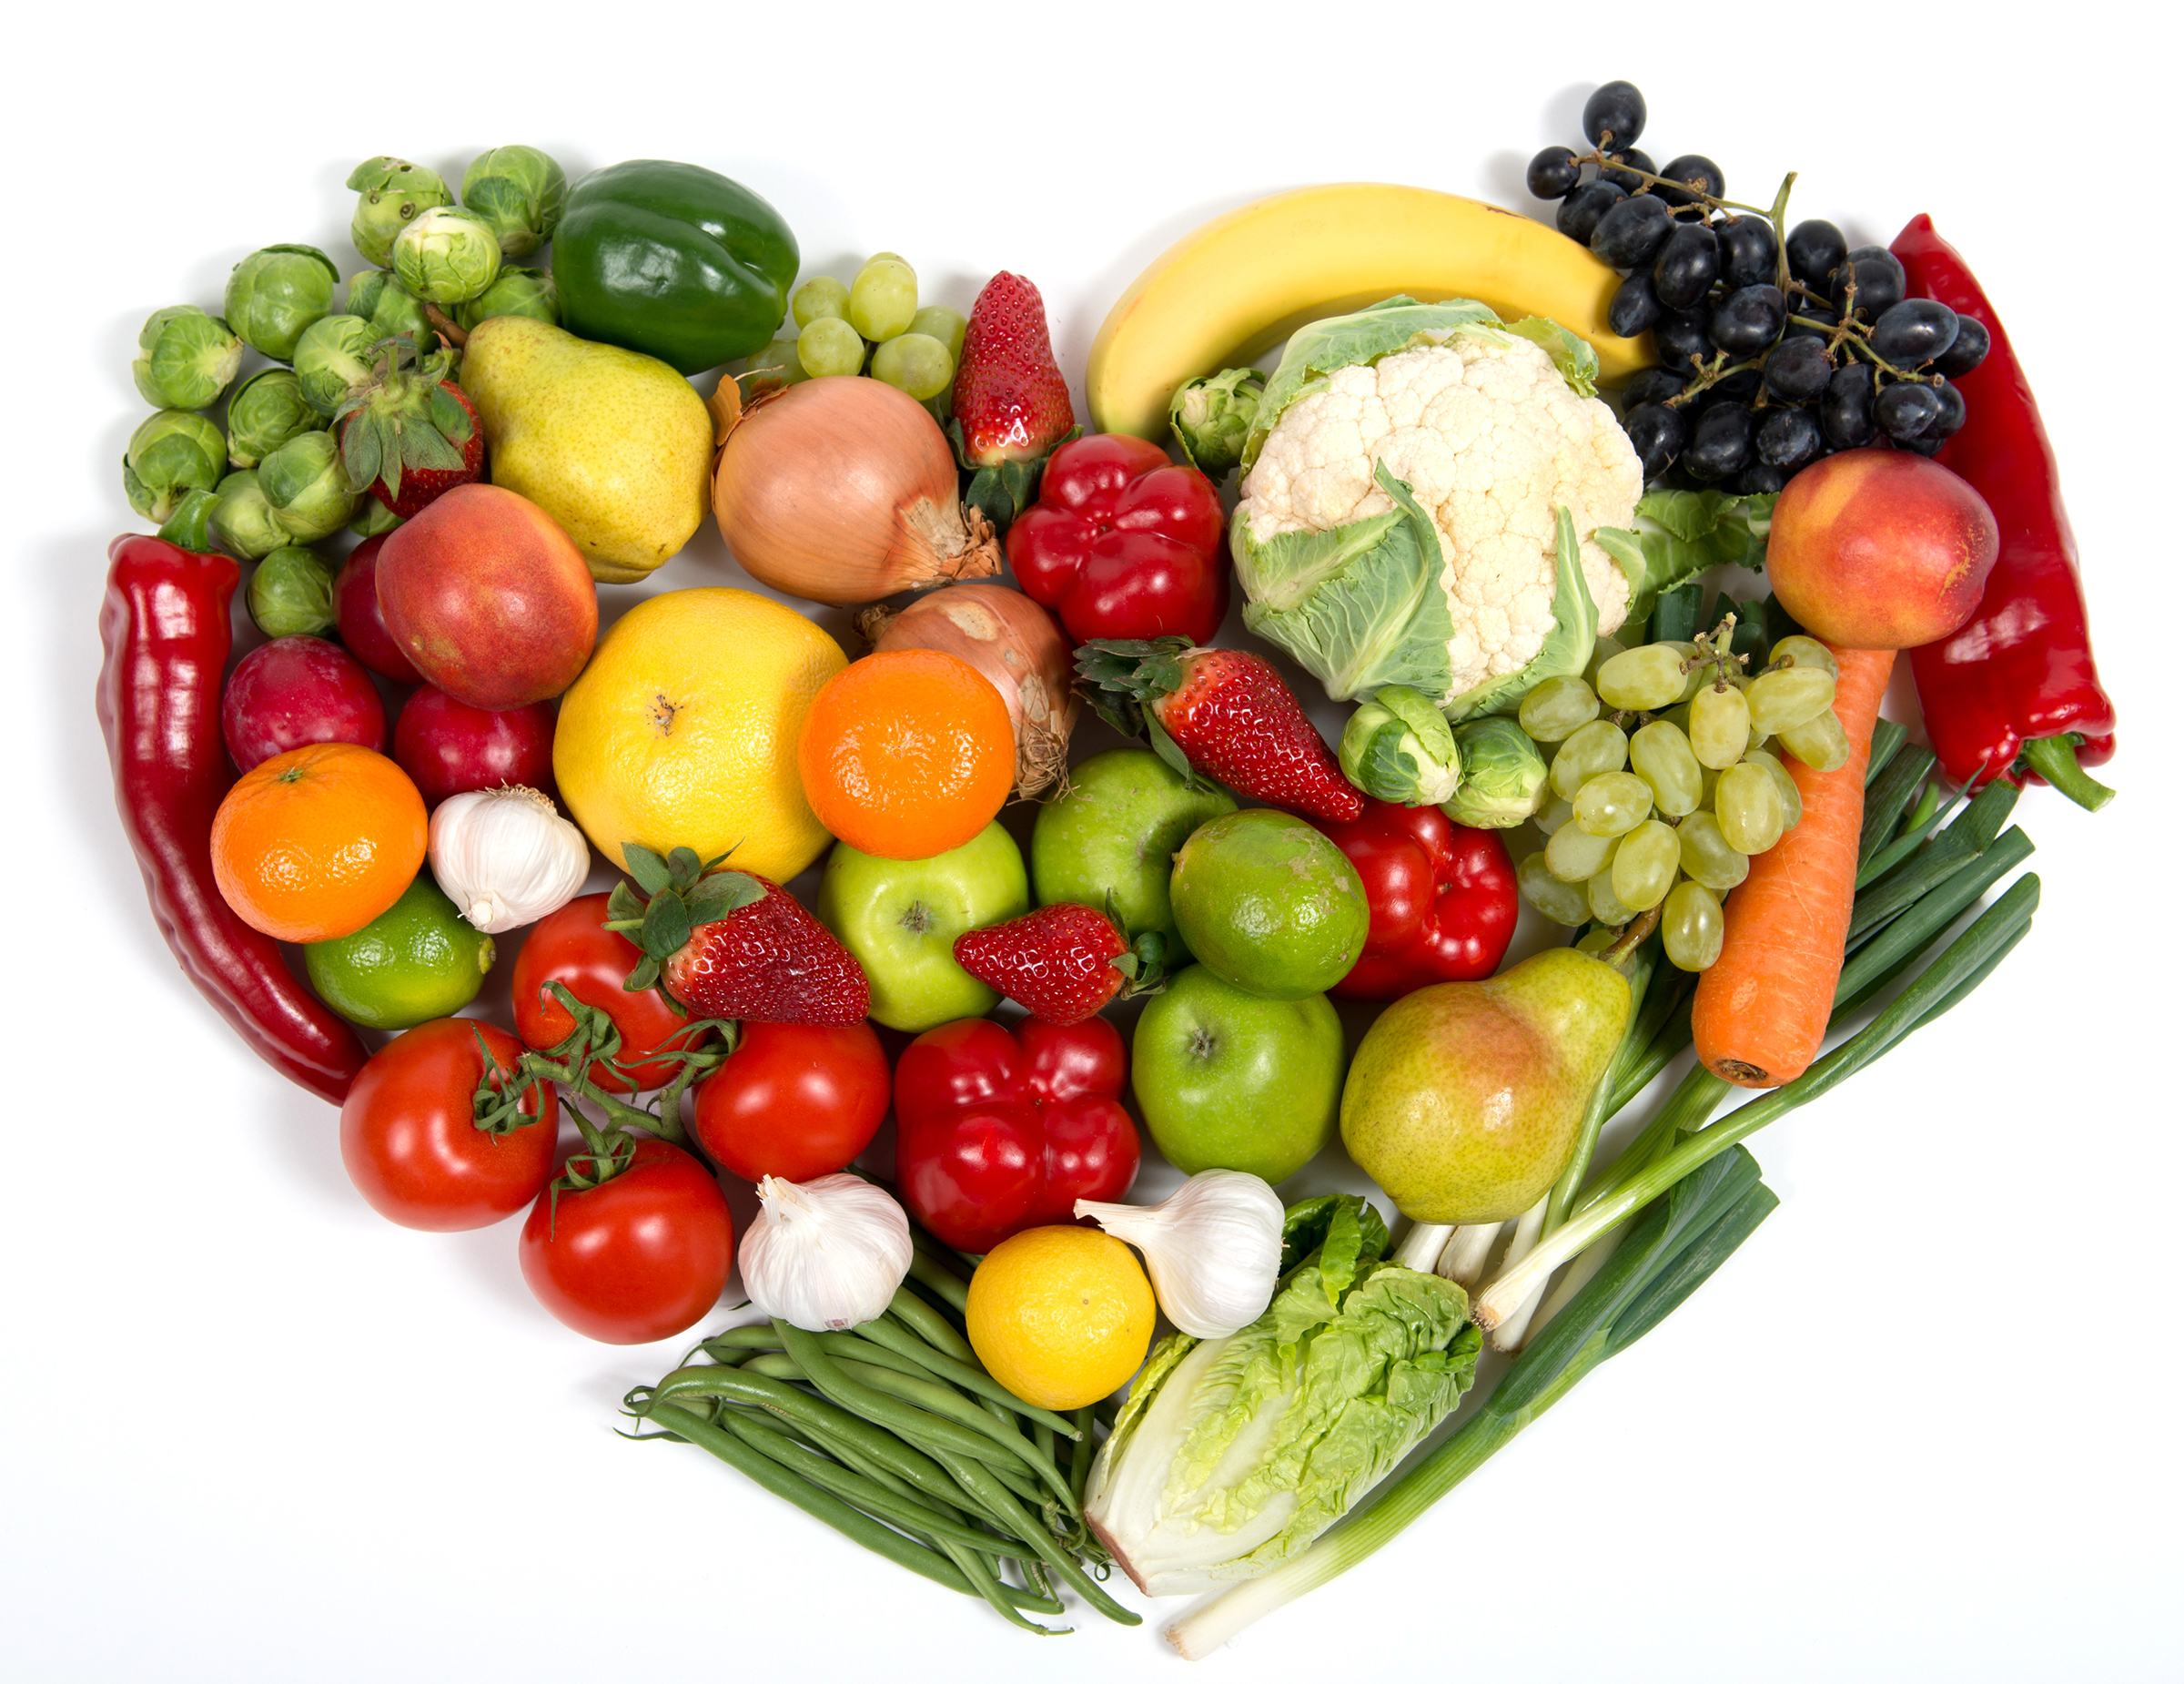 about-being-vegan